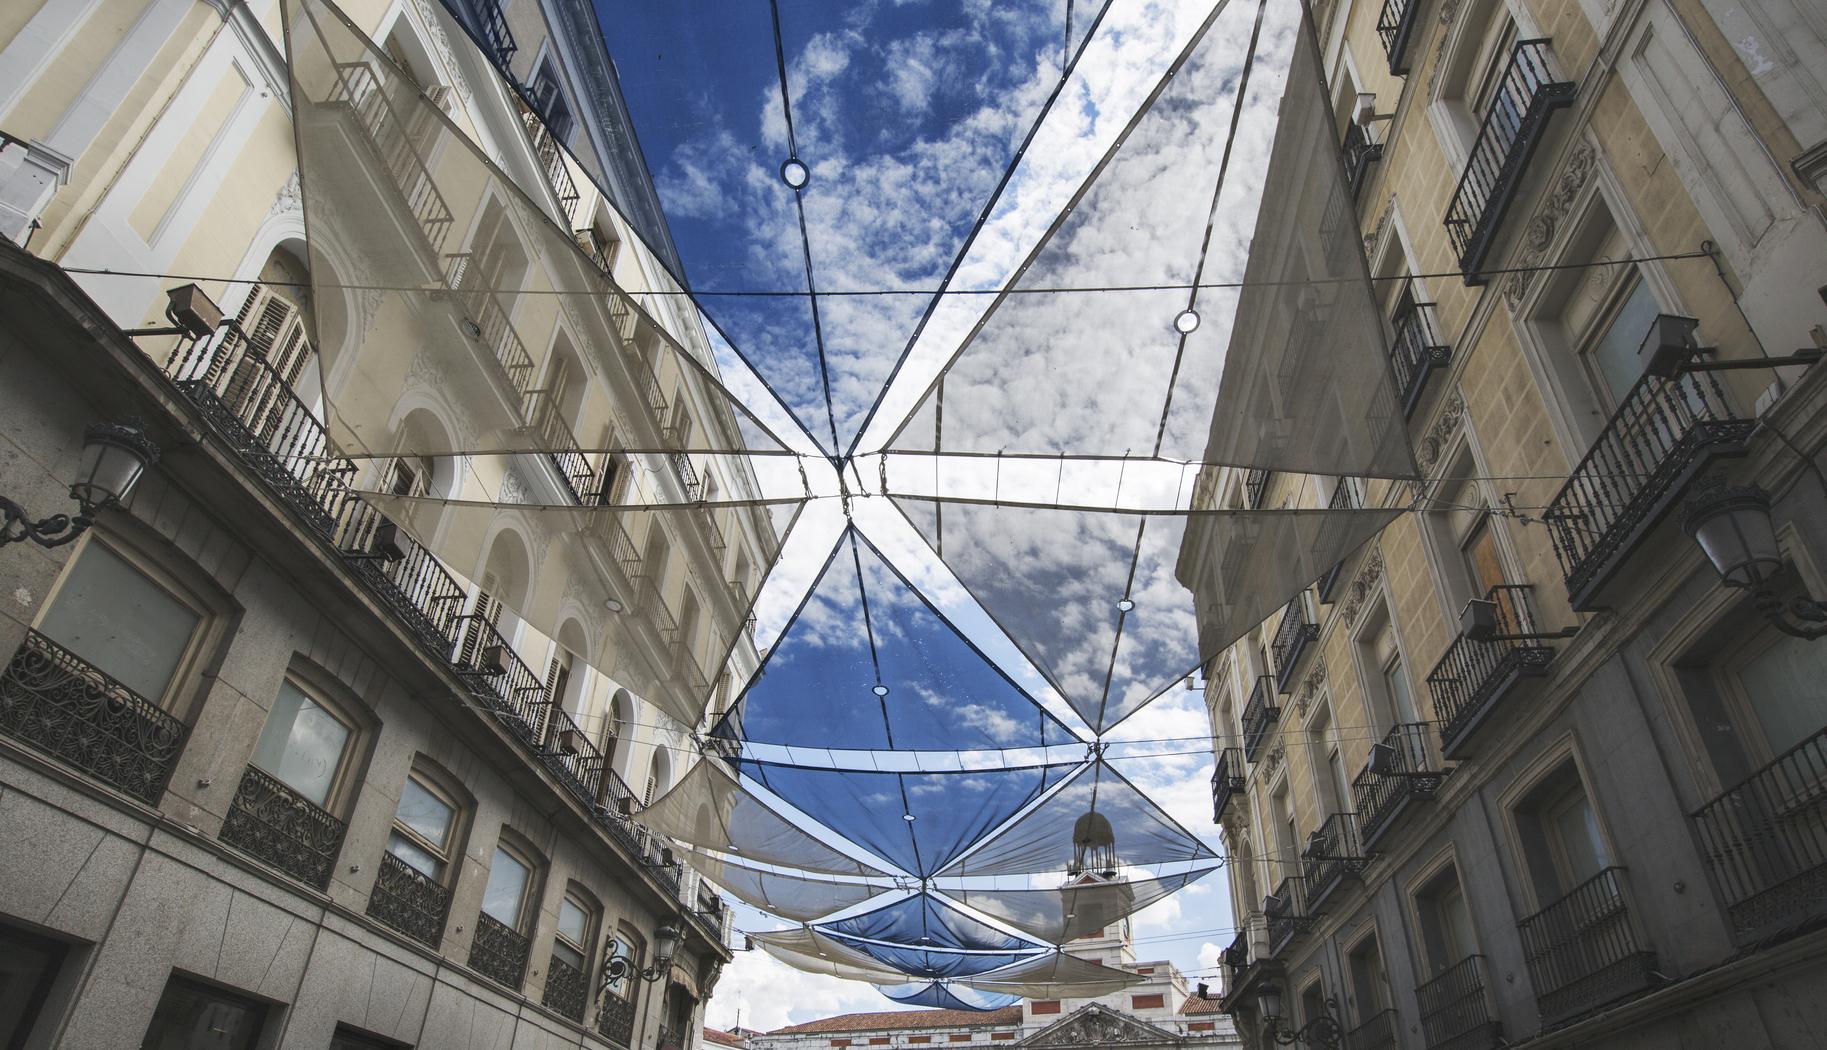 Typical toldo sunshade on spanish buildings